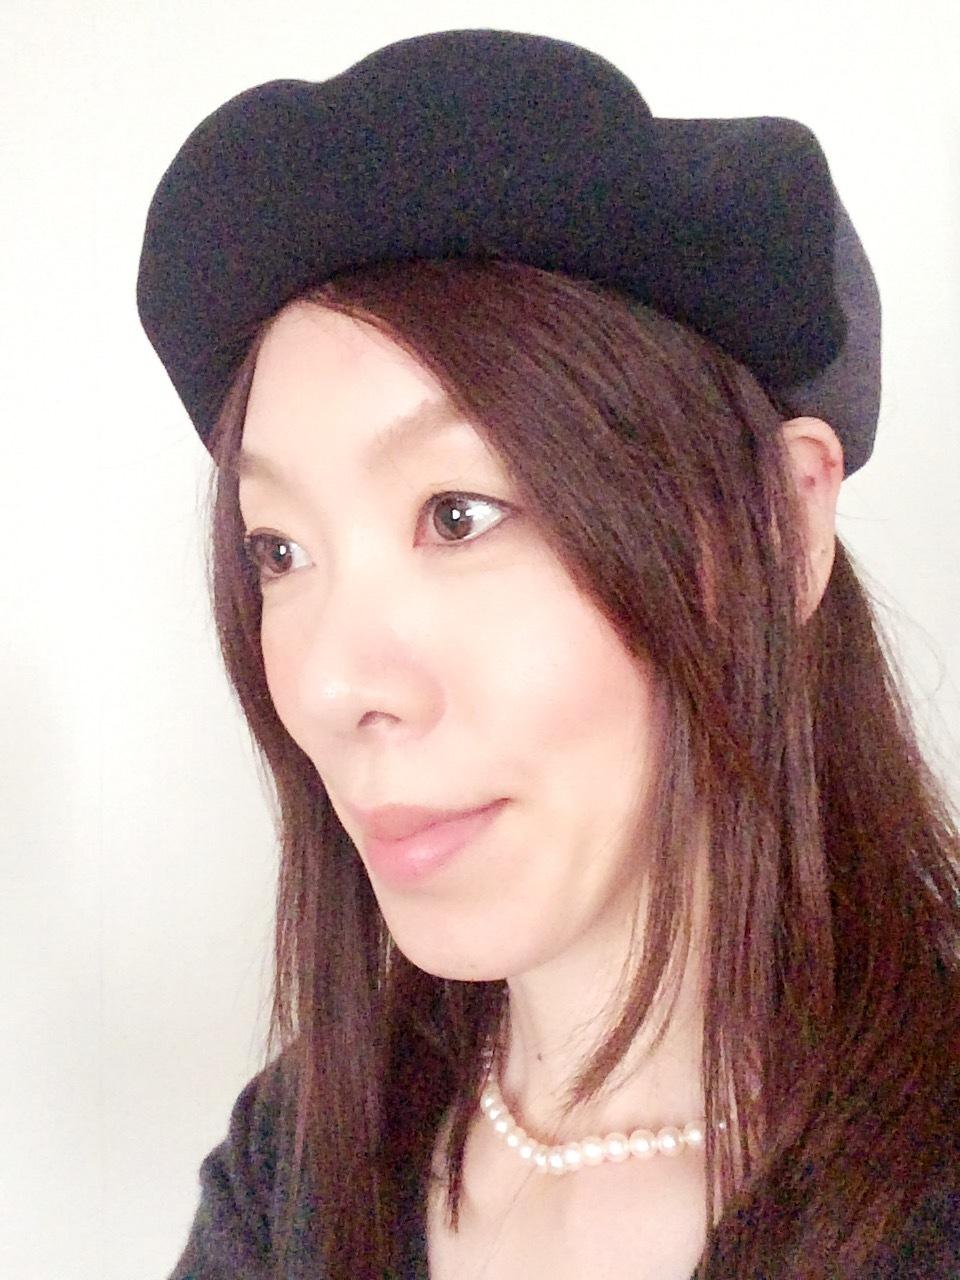 「BUENA VISTA×boinas eloseguiのバスク帽でフィールドジャケットをブラッシュアップ!」_1_3-2